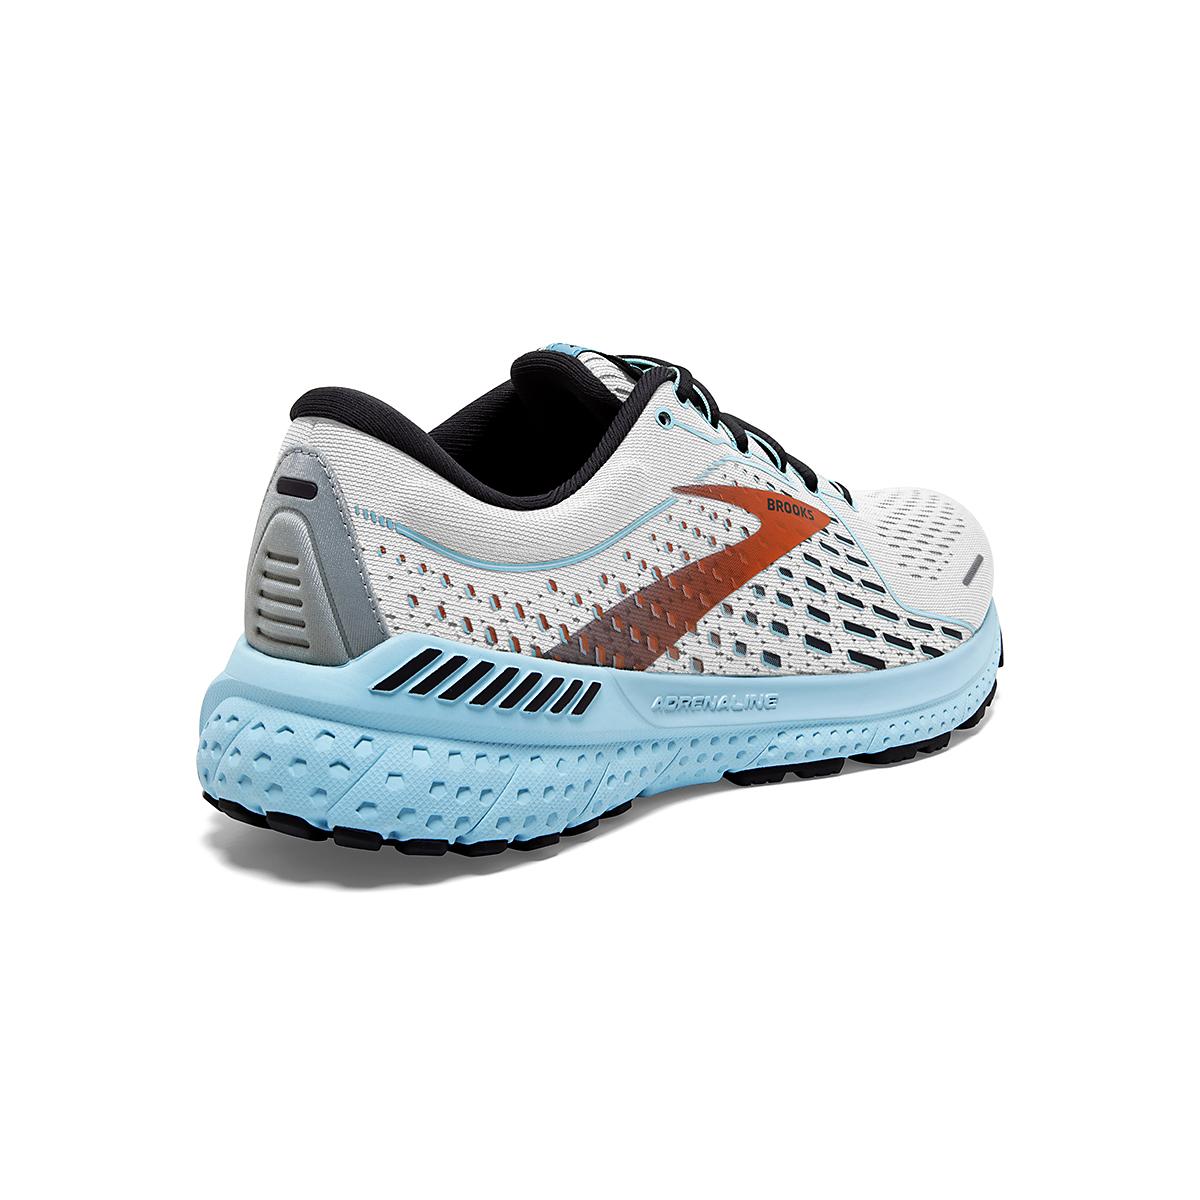 Women's Brooks Adrenaline GTS 21 Running Shoe - Color: White/Alloy - Size: 5 - Width: Regular, White/Alloy, large, image 4